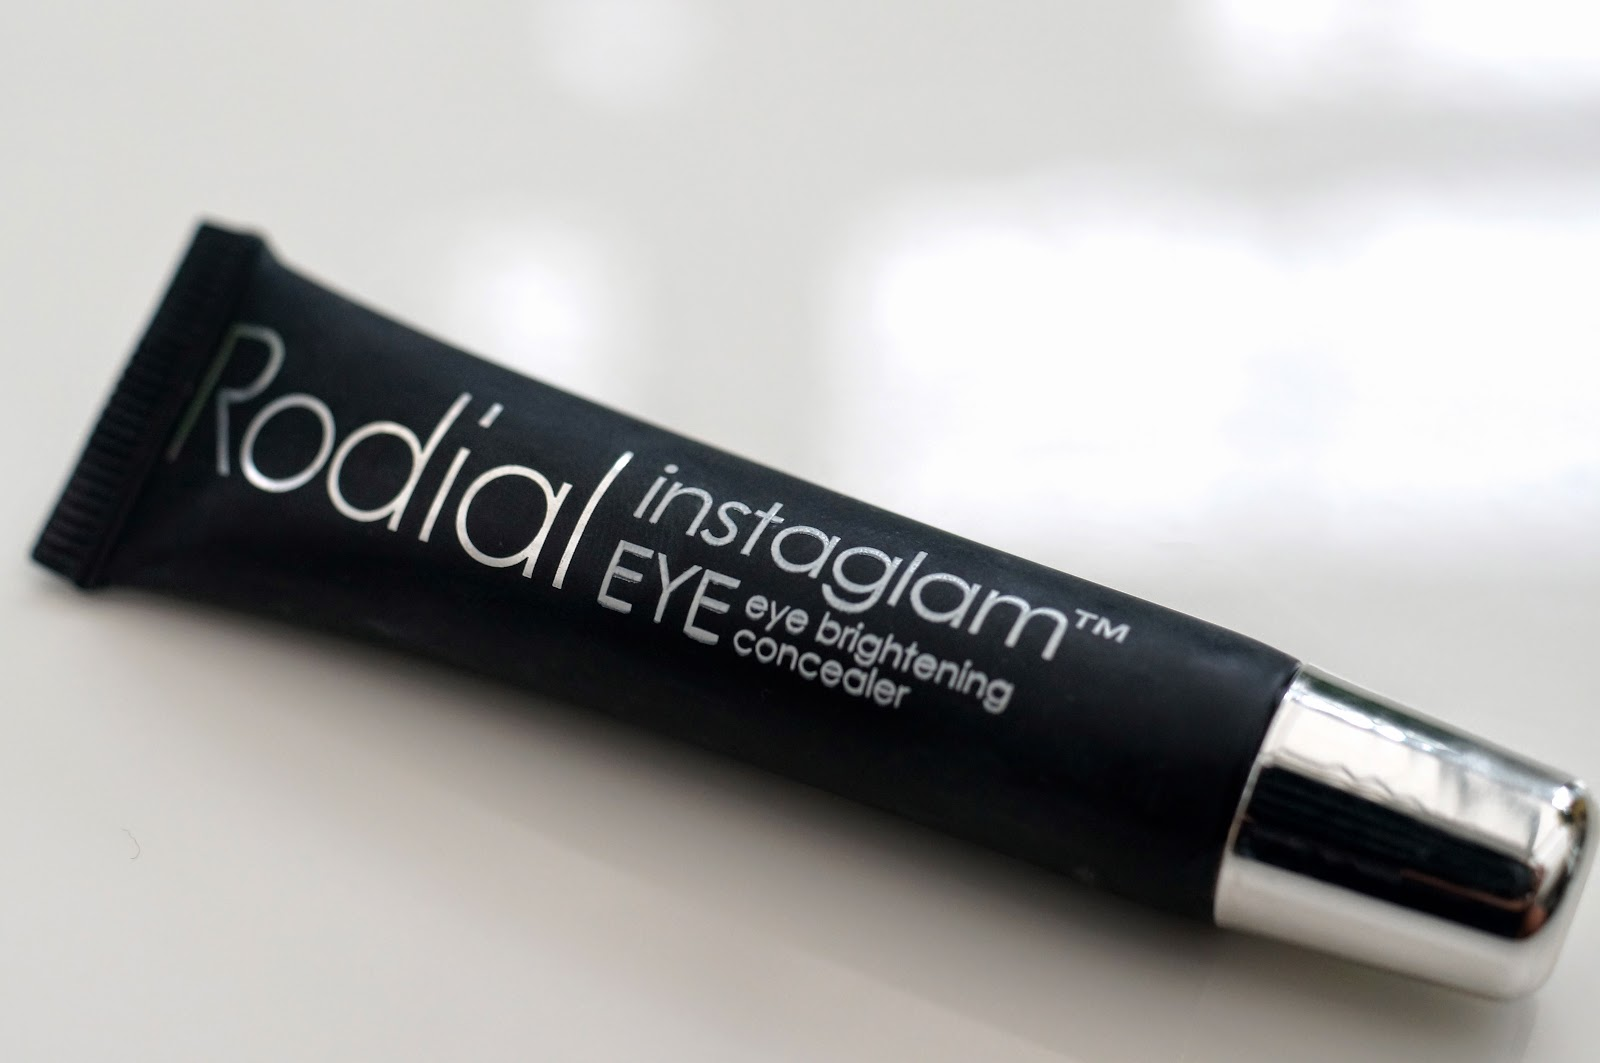 rodial instaglam eye brightening concealer